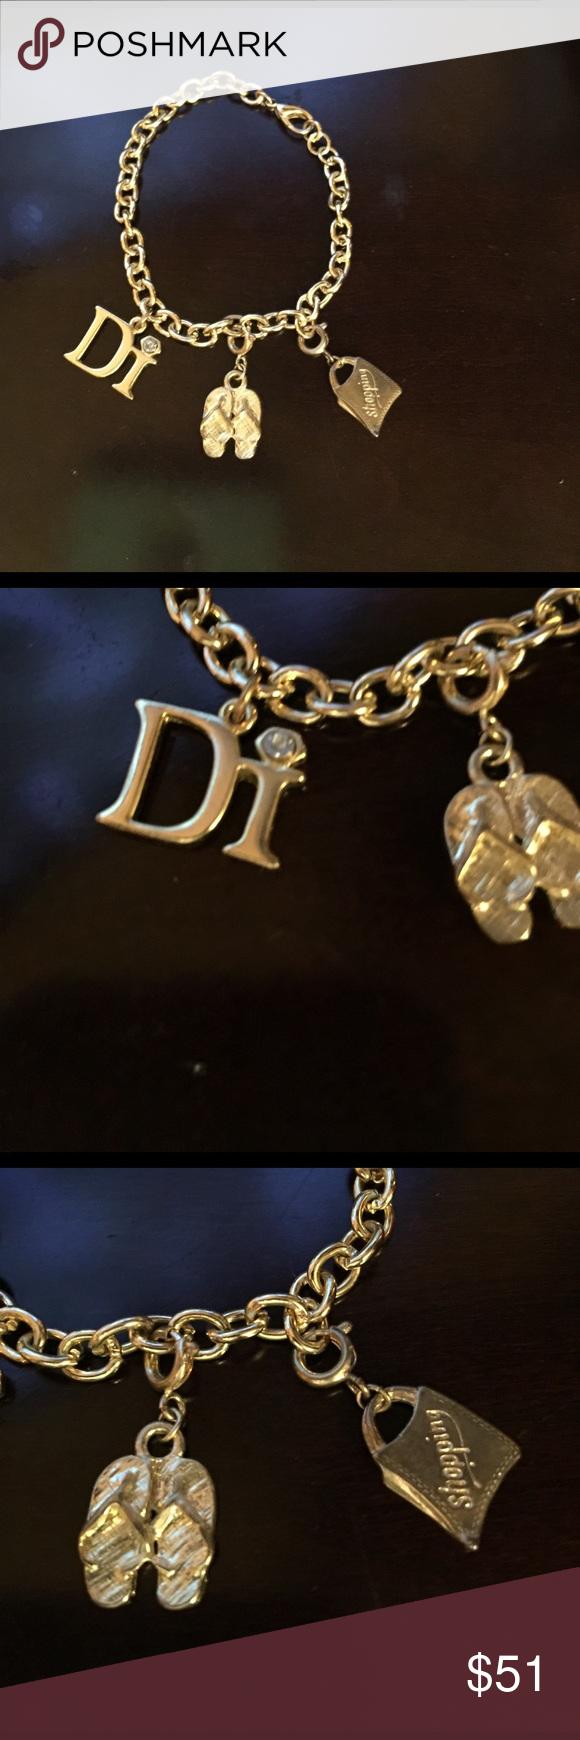 Christian Dior charm bracelet Christian Dior bracelet Christian Dior Jewelry Bracelets